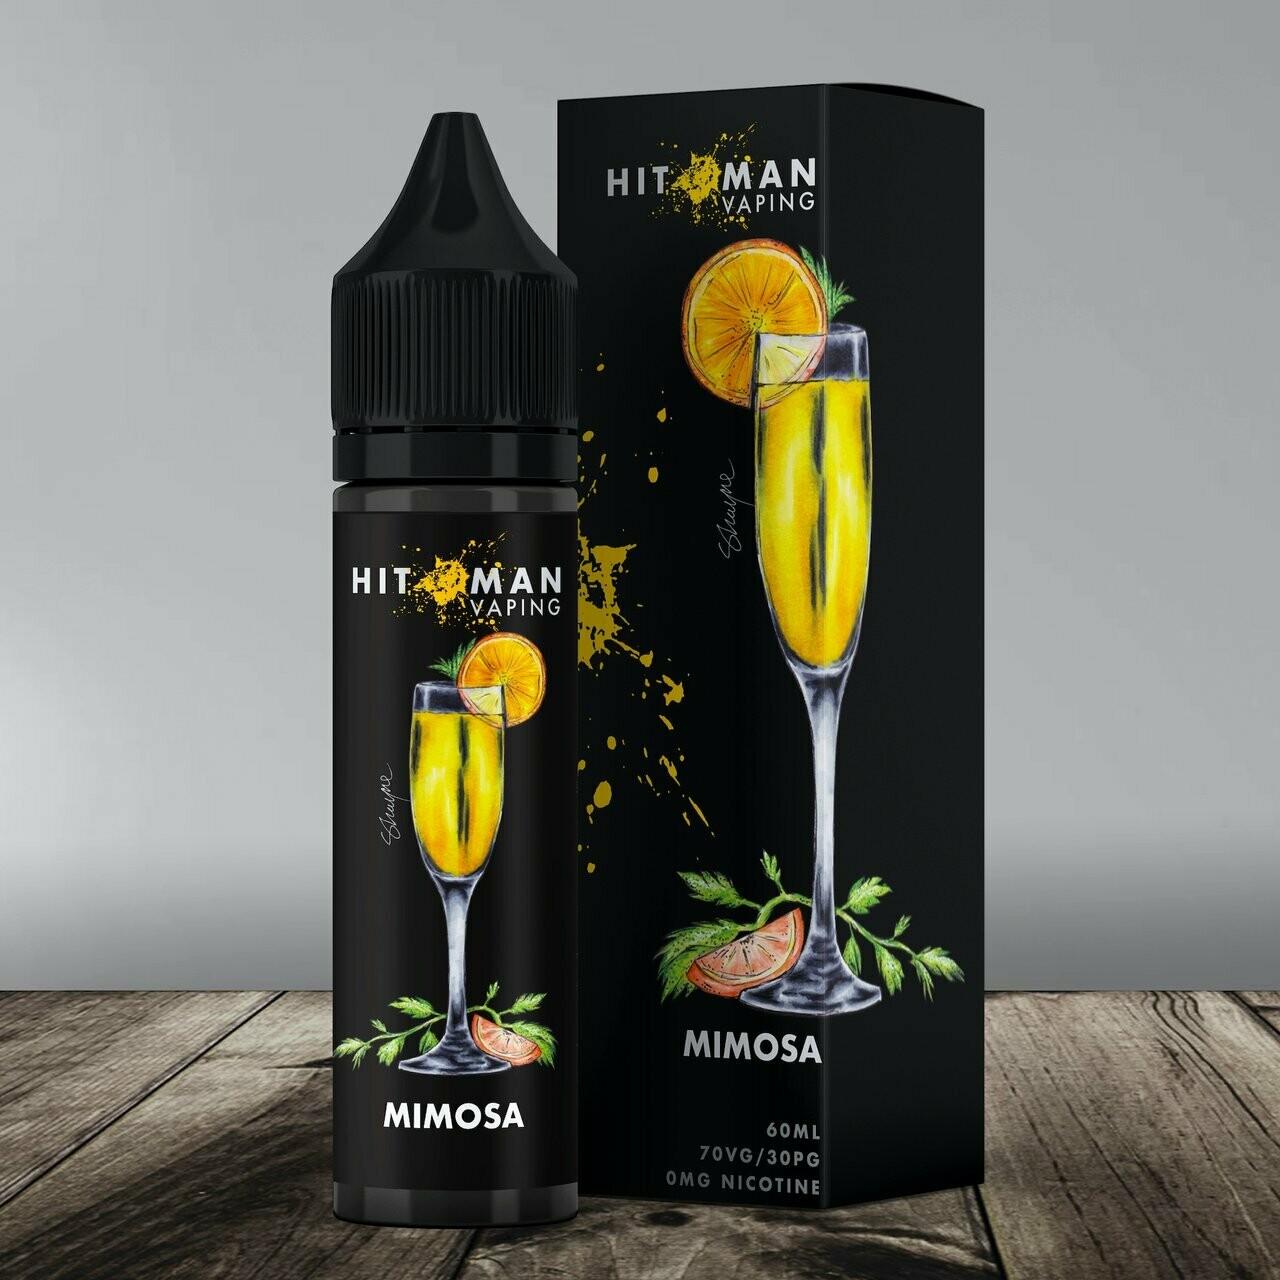 Hitman Vaping   Mimosa